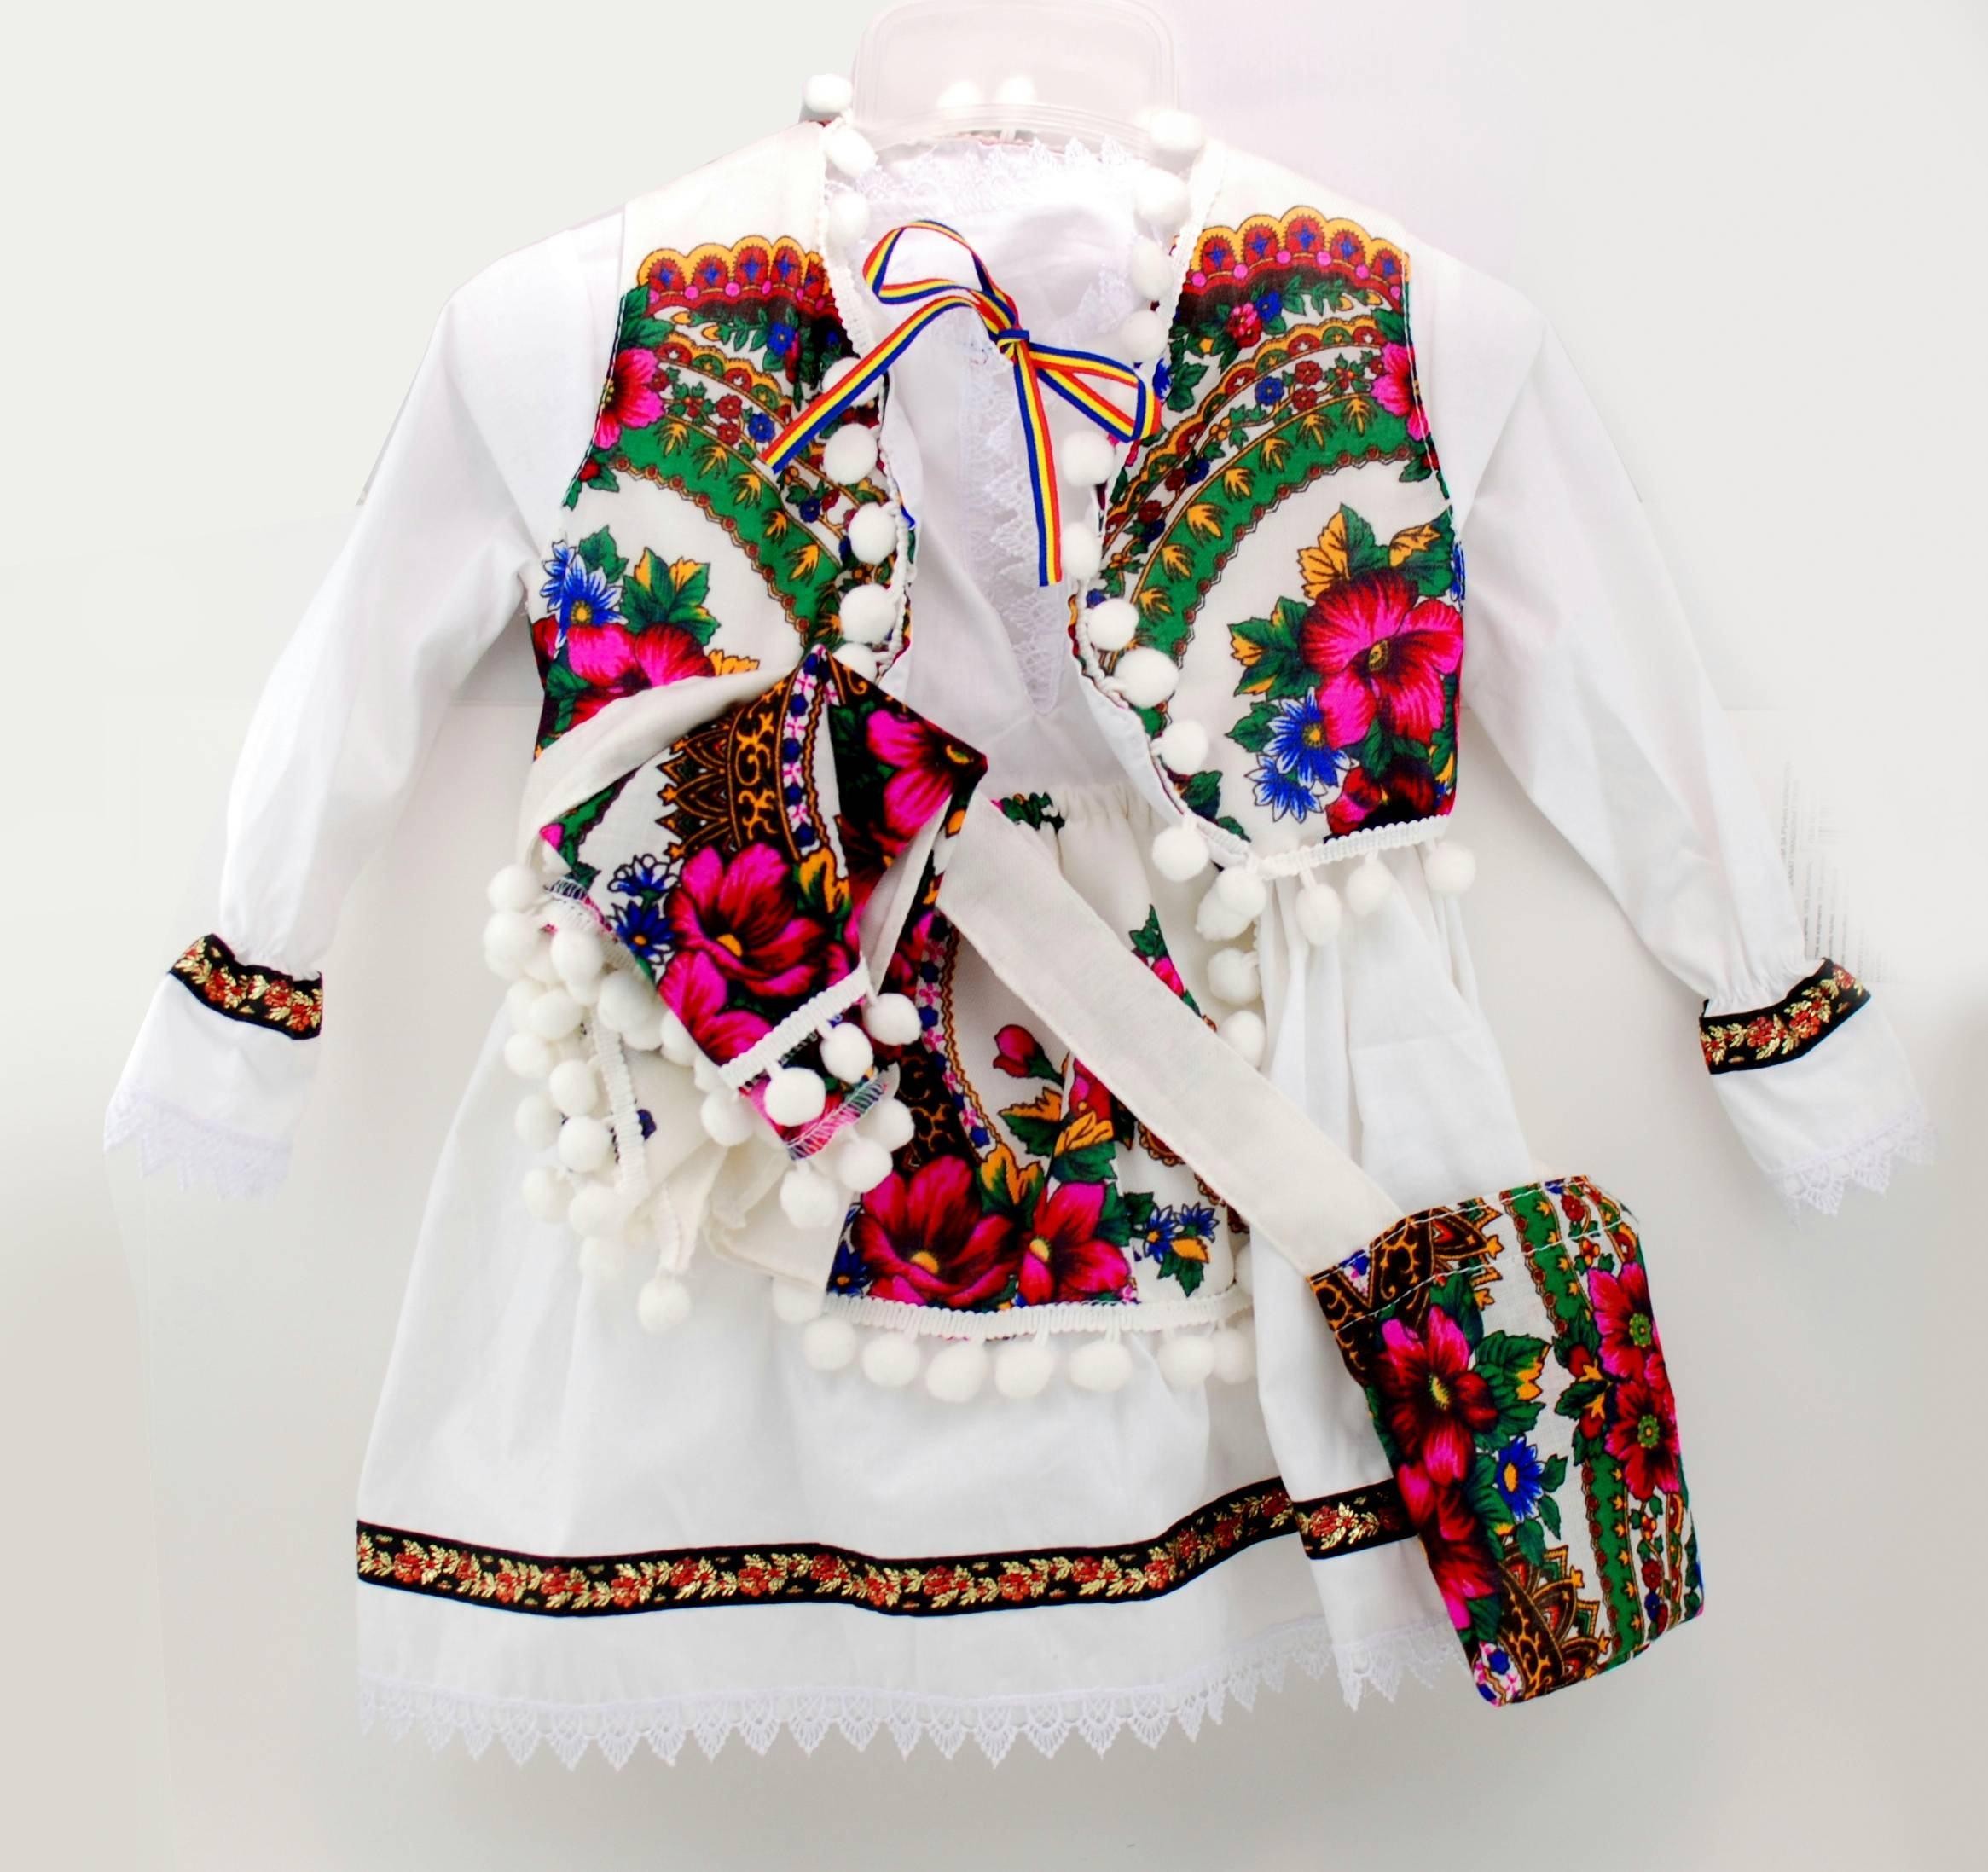 Costum popular - traditional pentru botez fetite 6-9 luni